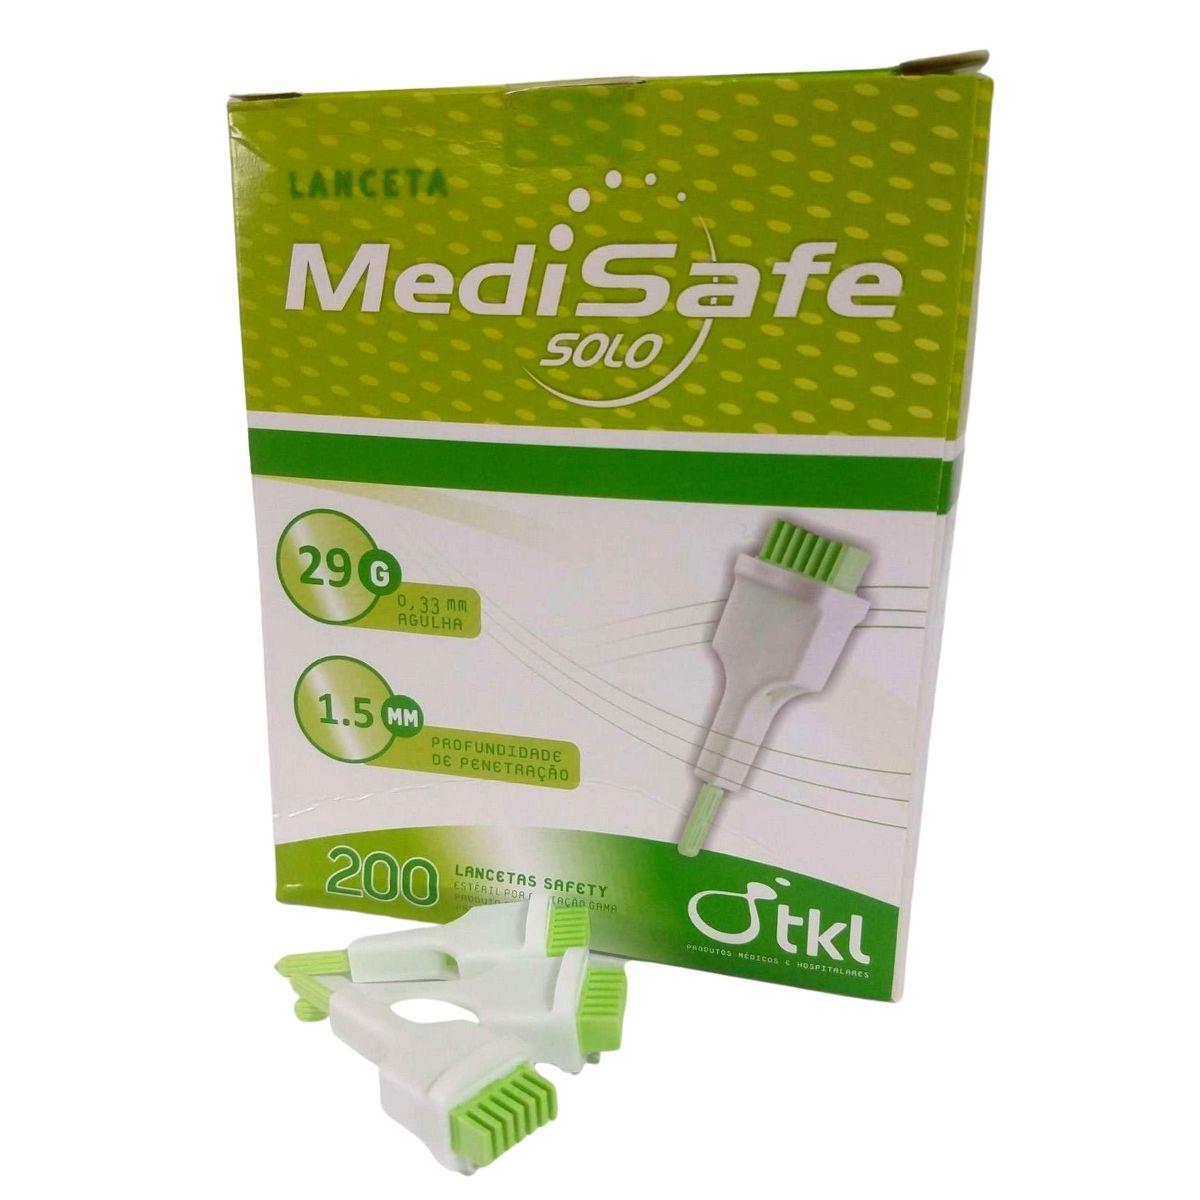 Lanceta de Segurança 29G 0,33X1,5mm Medisafe TKL c/200 Unidades